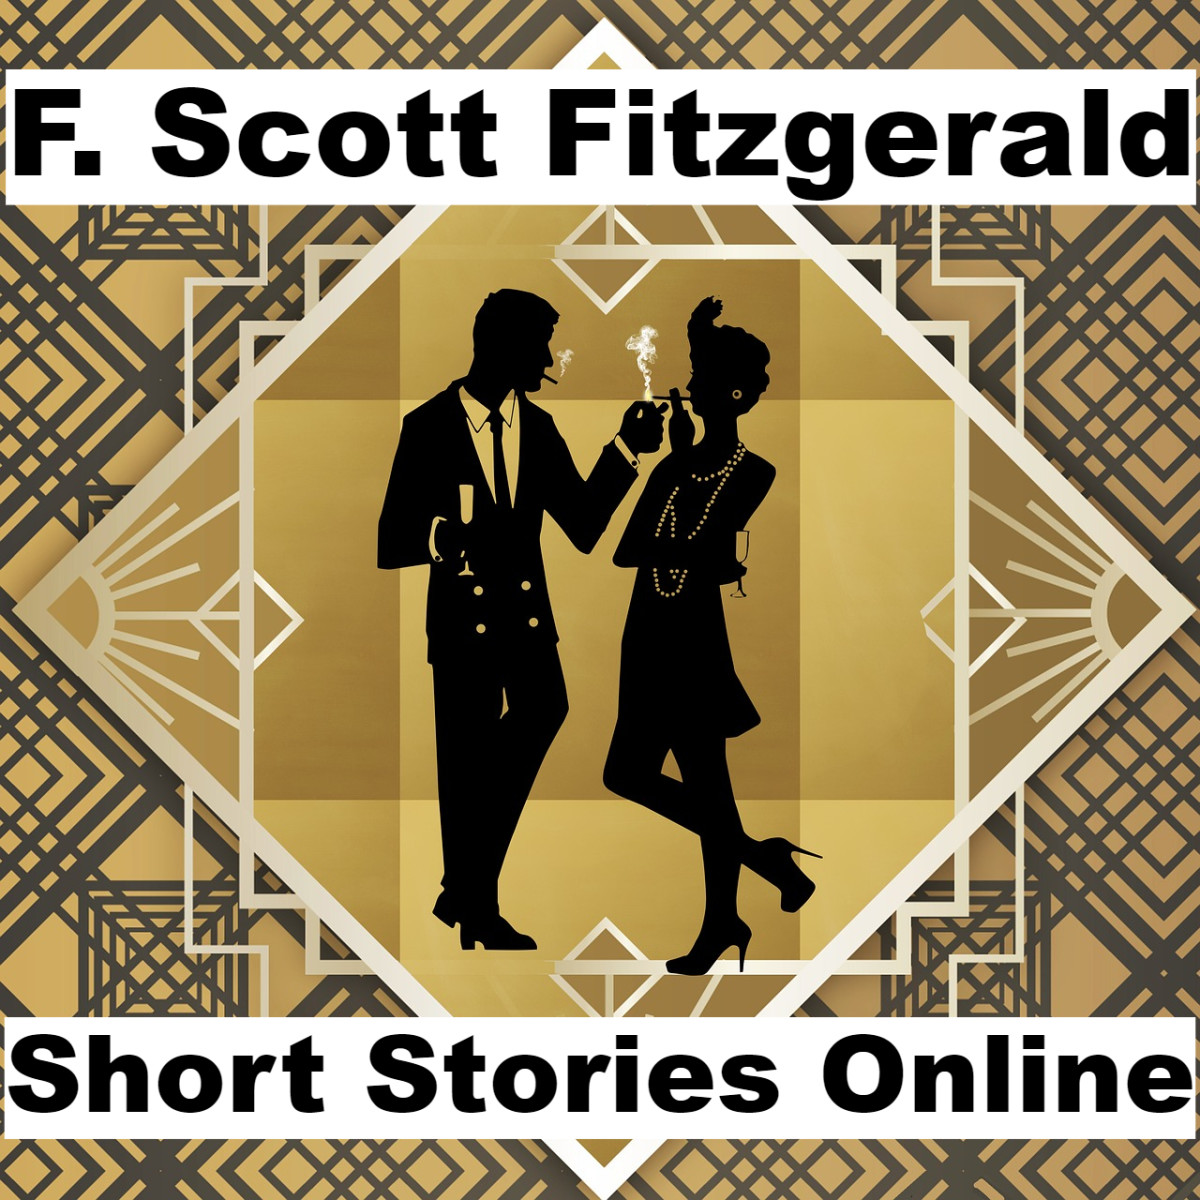 f-scott-fitzgerald-short-stories-online